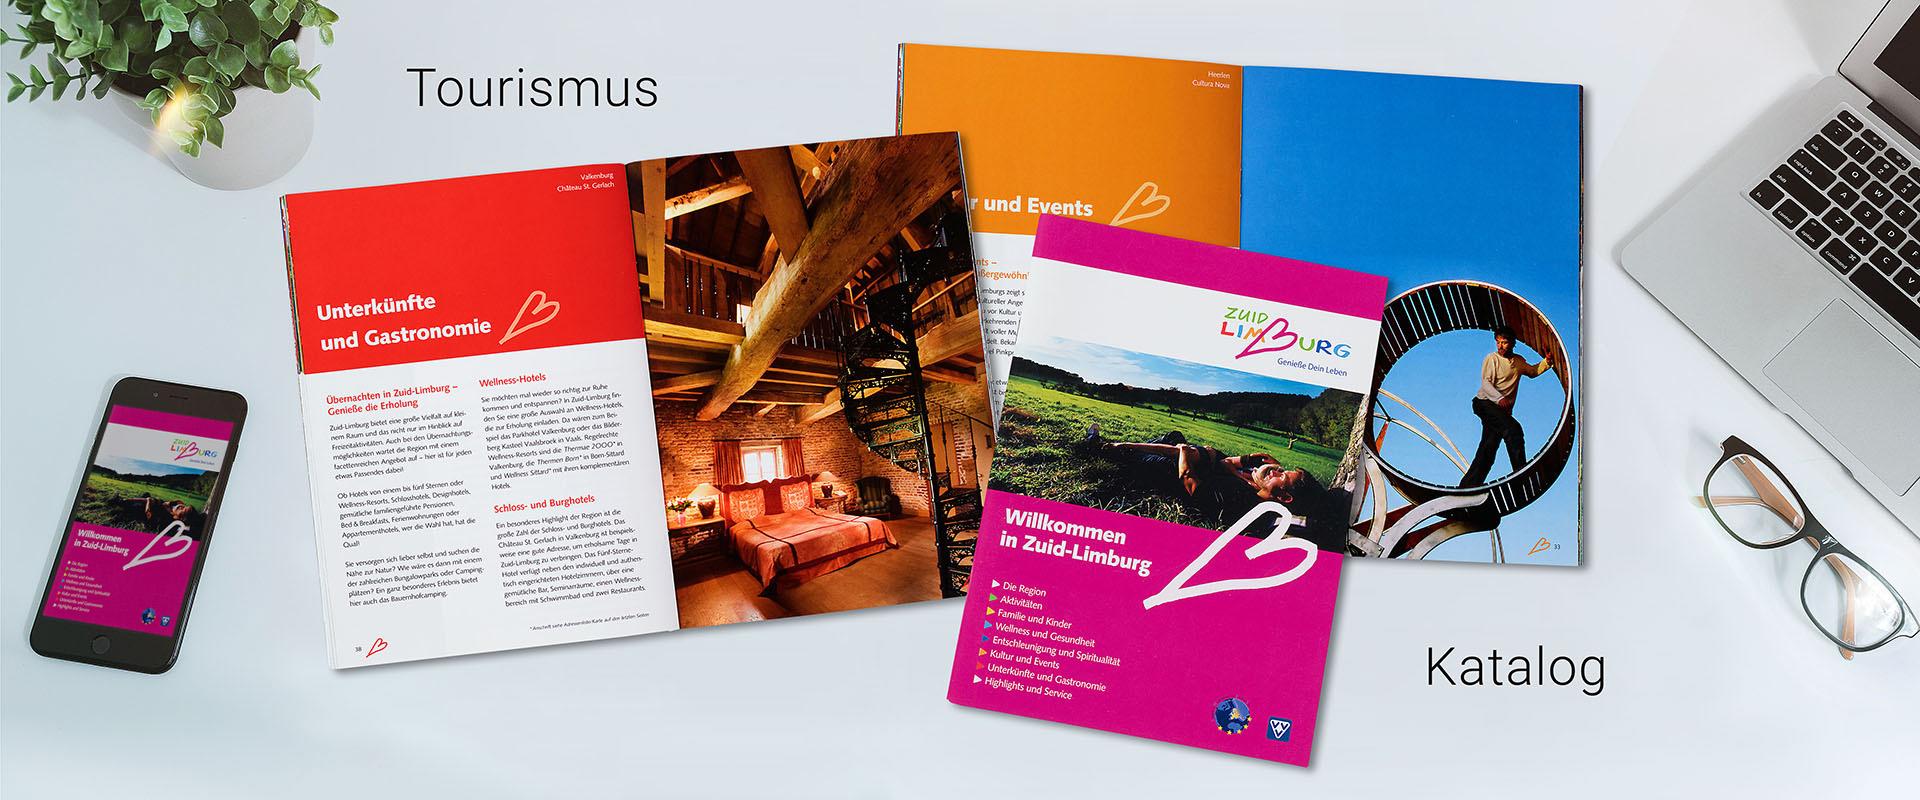 Tourismus_Katalog_mit_Handy_800